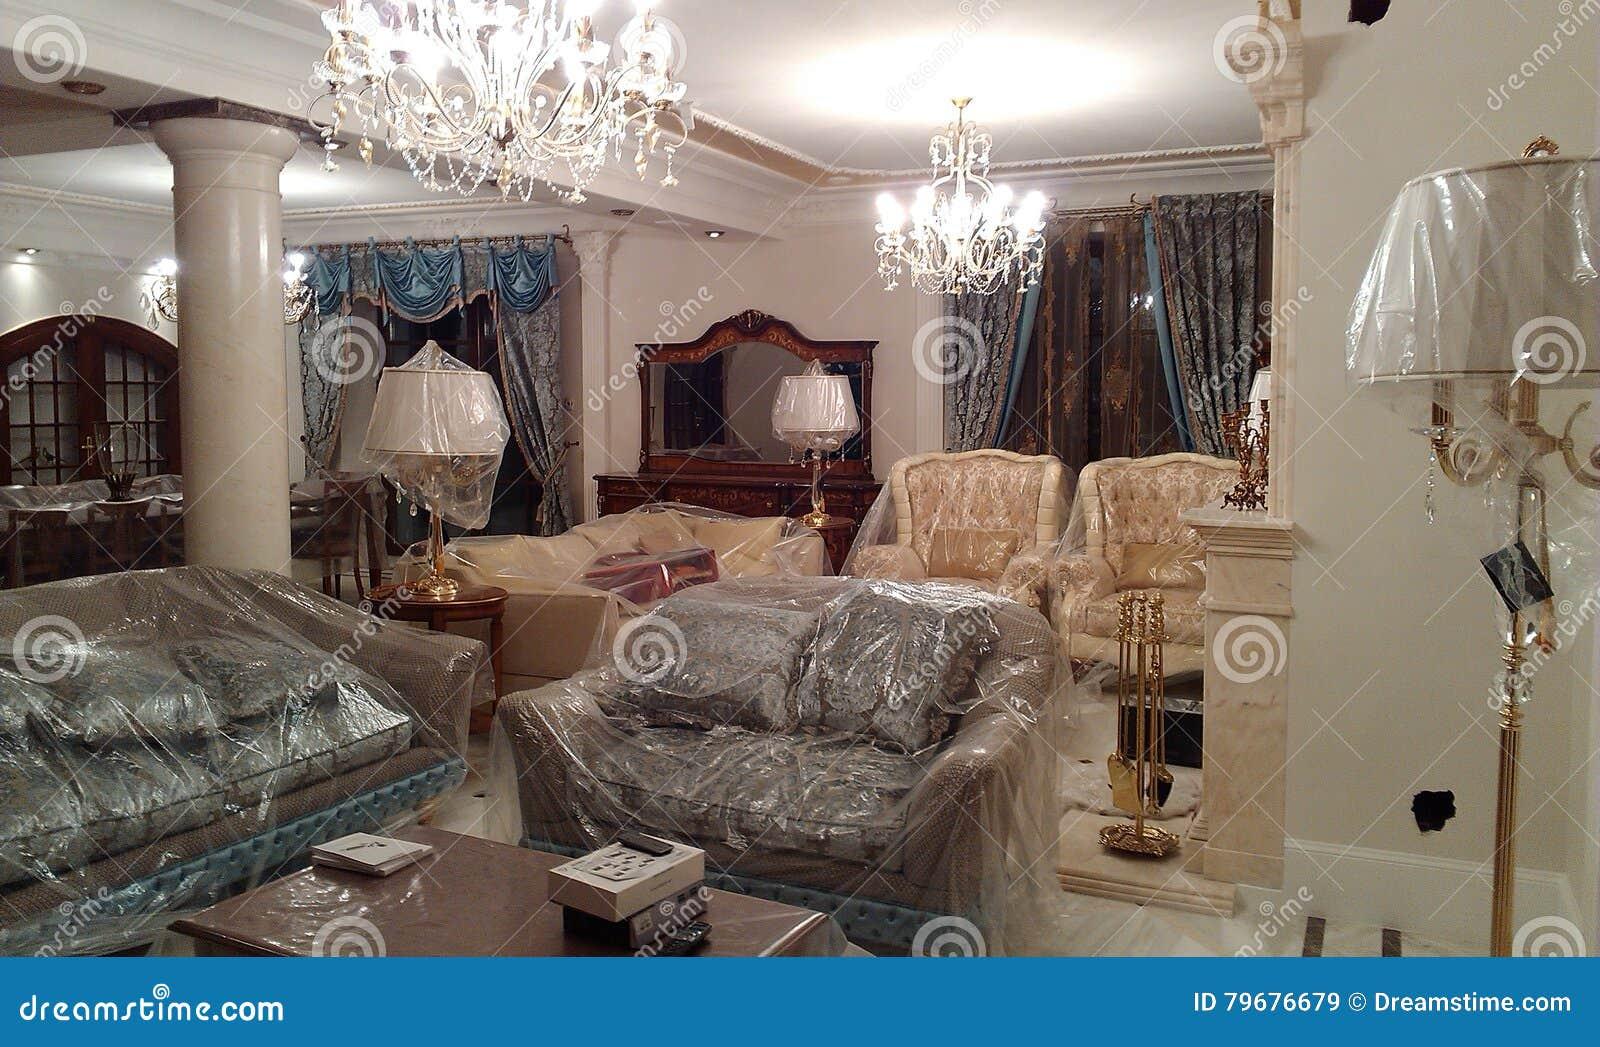 Eleganter Innenraum im Stil des Anfangs des 18. Jahrhunderts